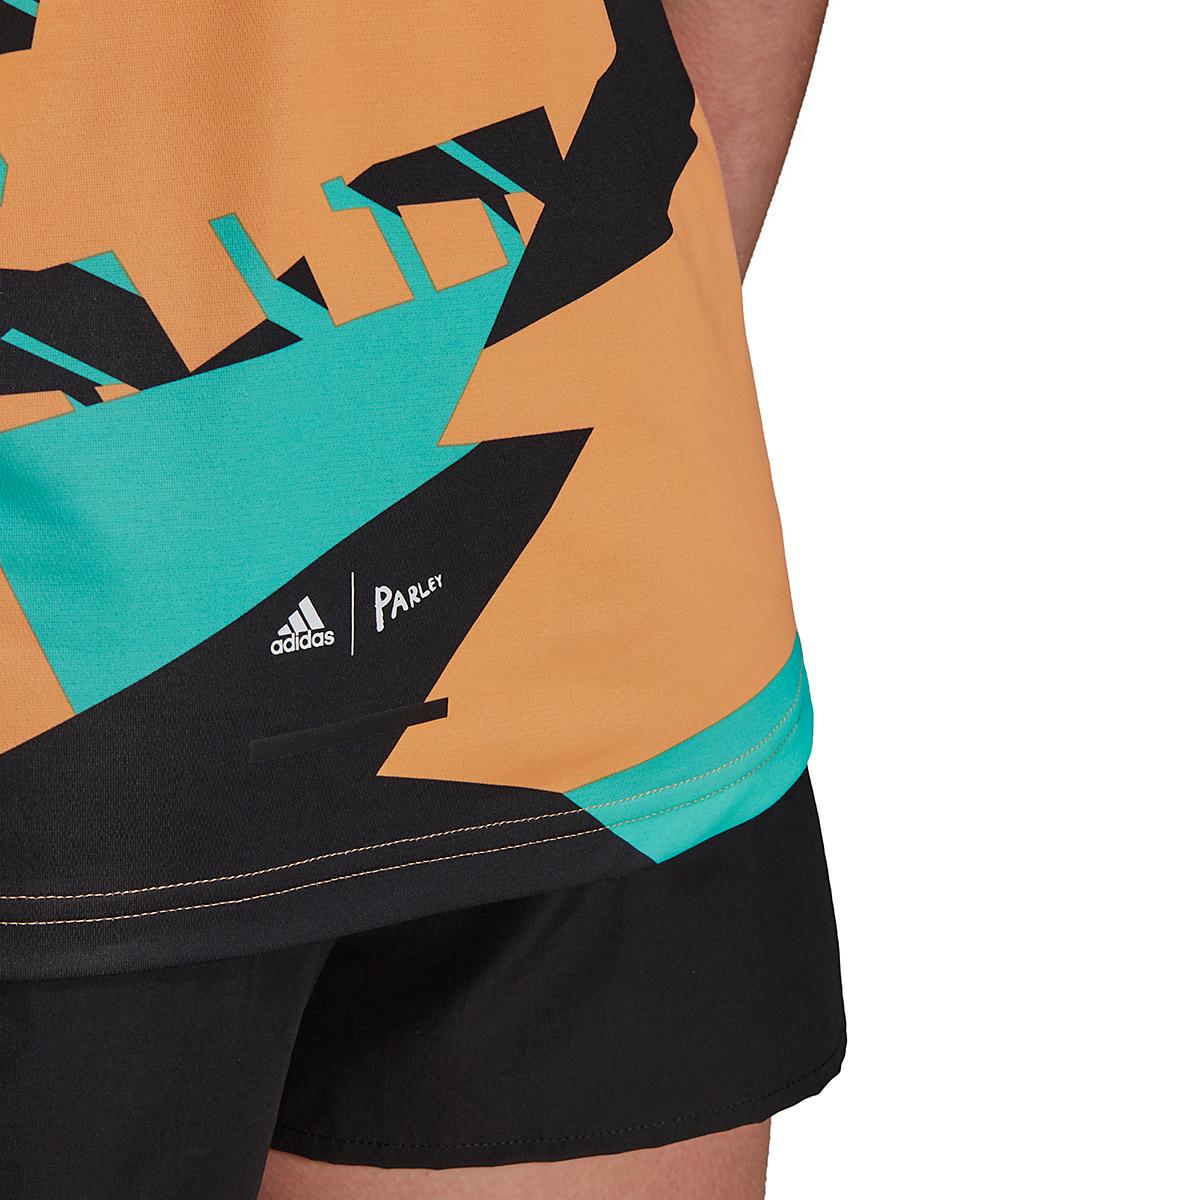 Women's Adidas Terrex Parley Agravic TR Tank Top - Color: Hazy Orange - Size: XS, Hazy Orange, large, image 5